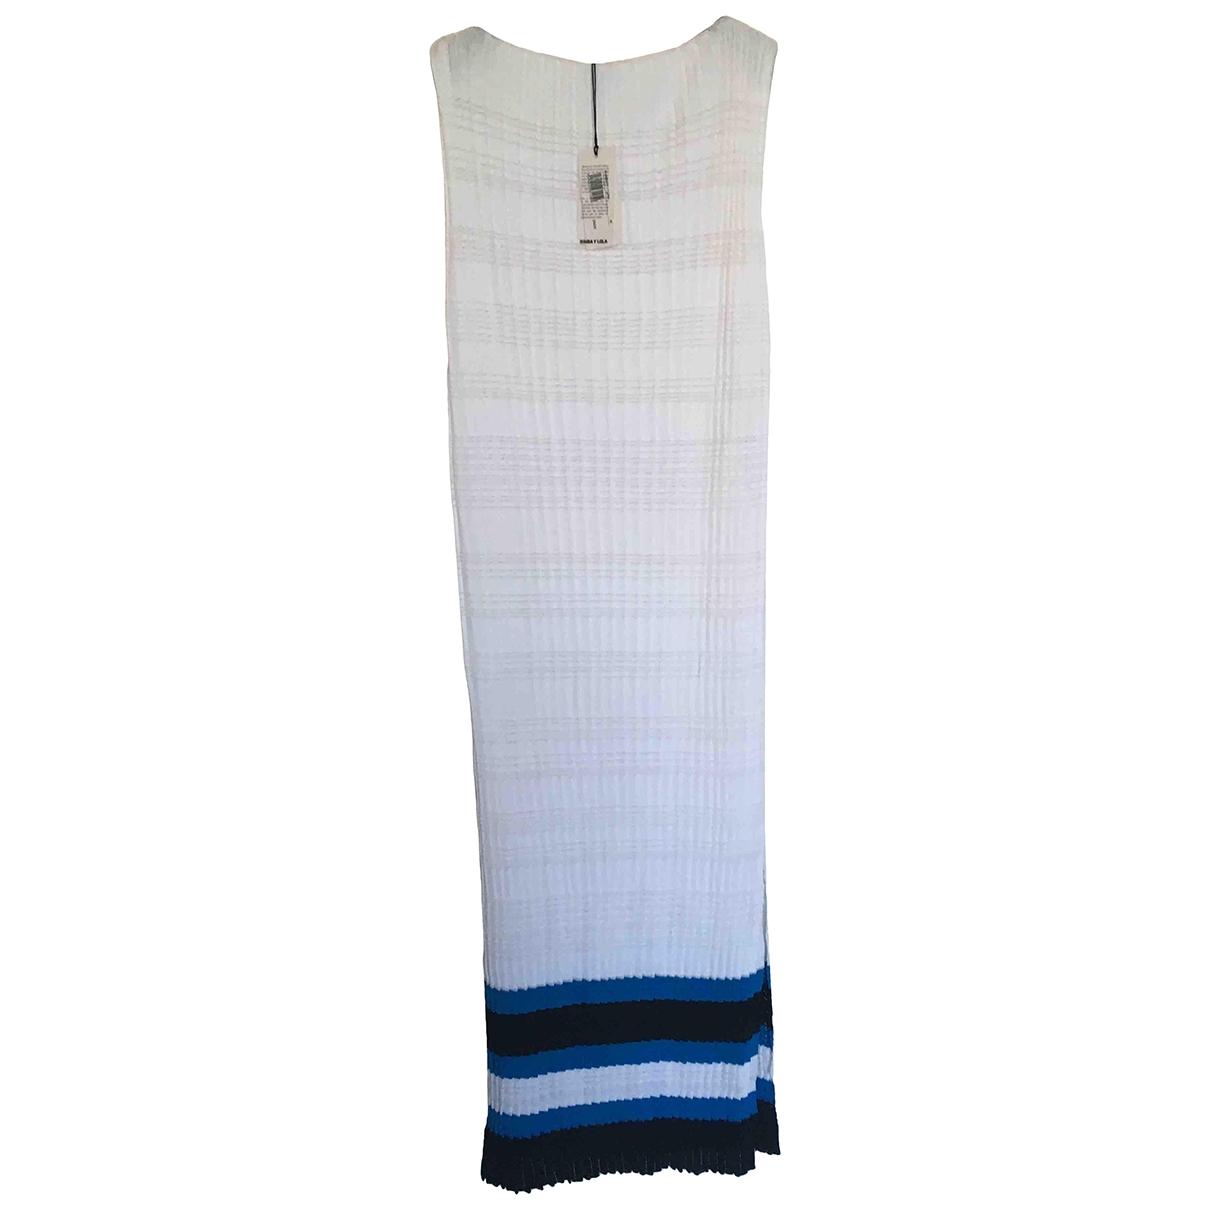 Bimba Y Lola \N White dress for Women M International